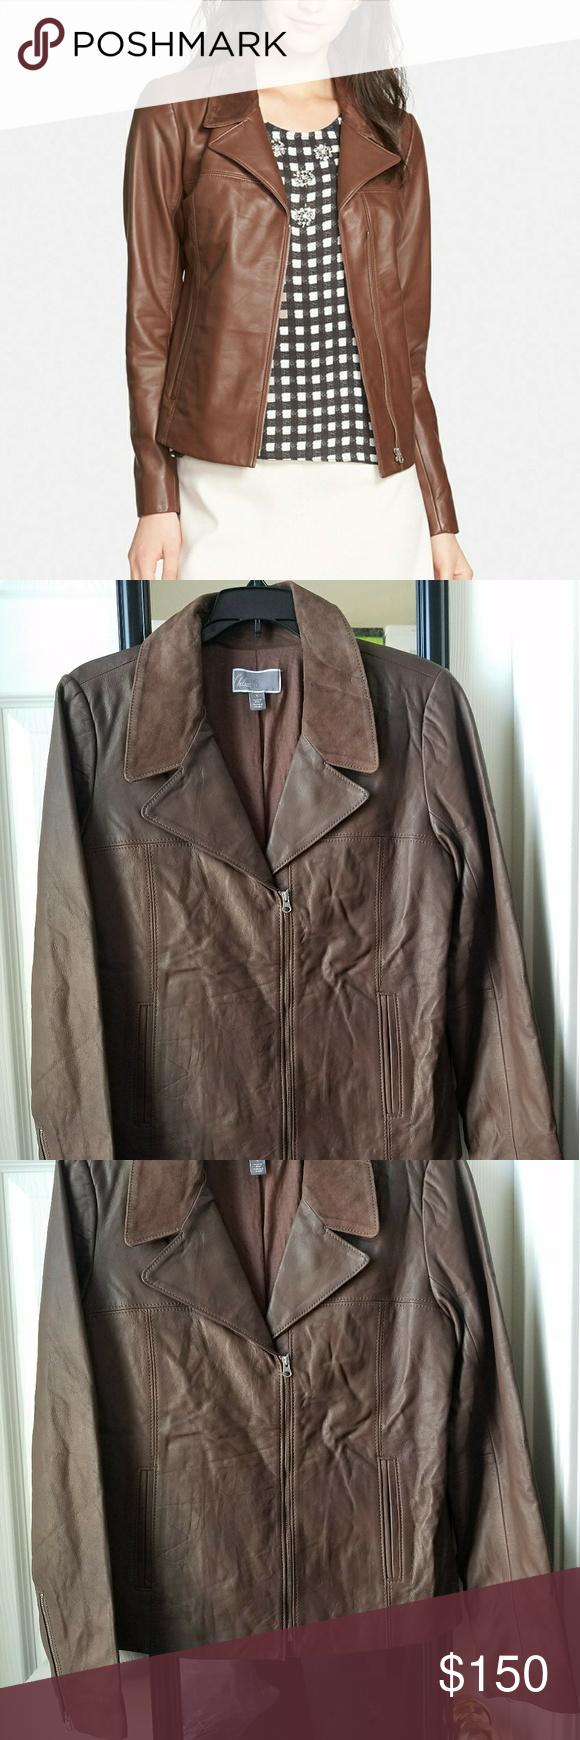 Chelsea28 Suede Lapel Zip Front Leather Jacket Leather Jacket Clothes Design Jackets [ 1740 x 580 Pixel ]